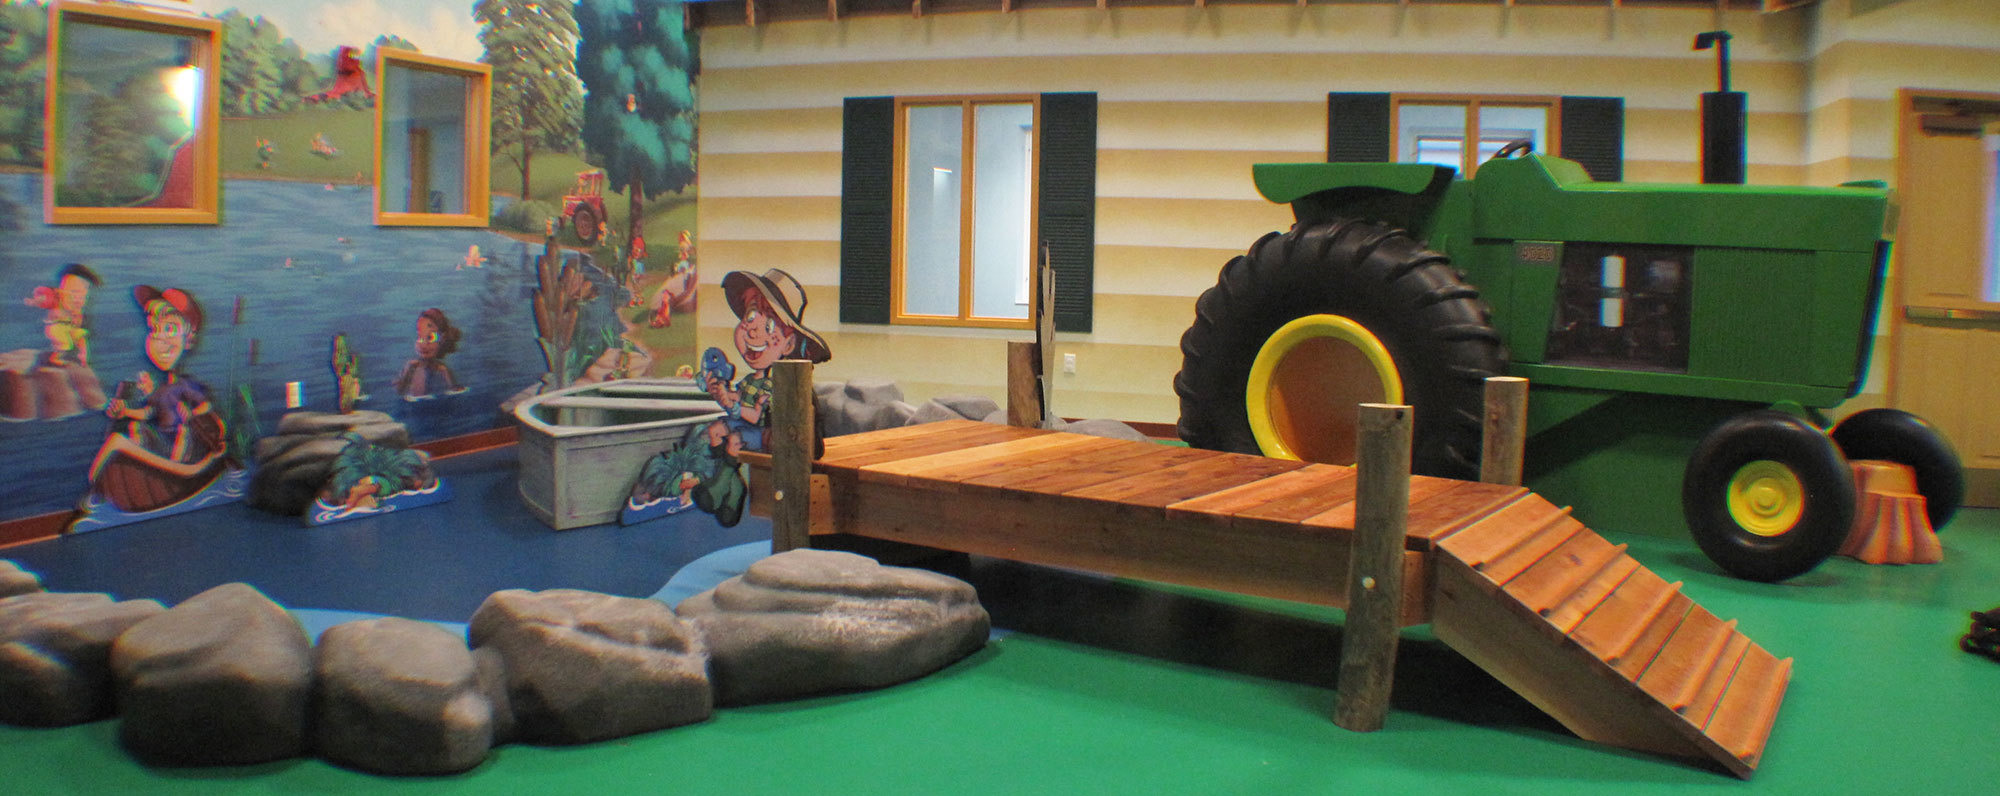 Farm Themed Environment at Hardin Baptist Church